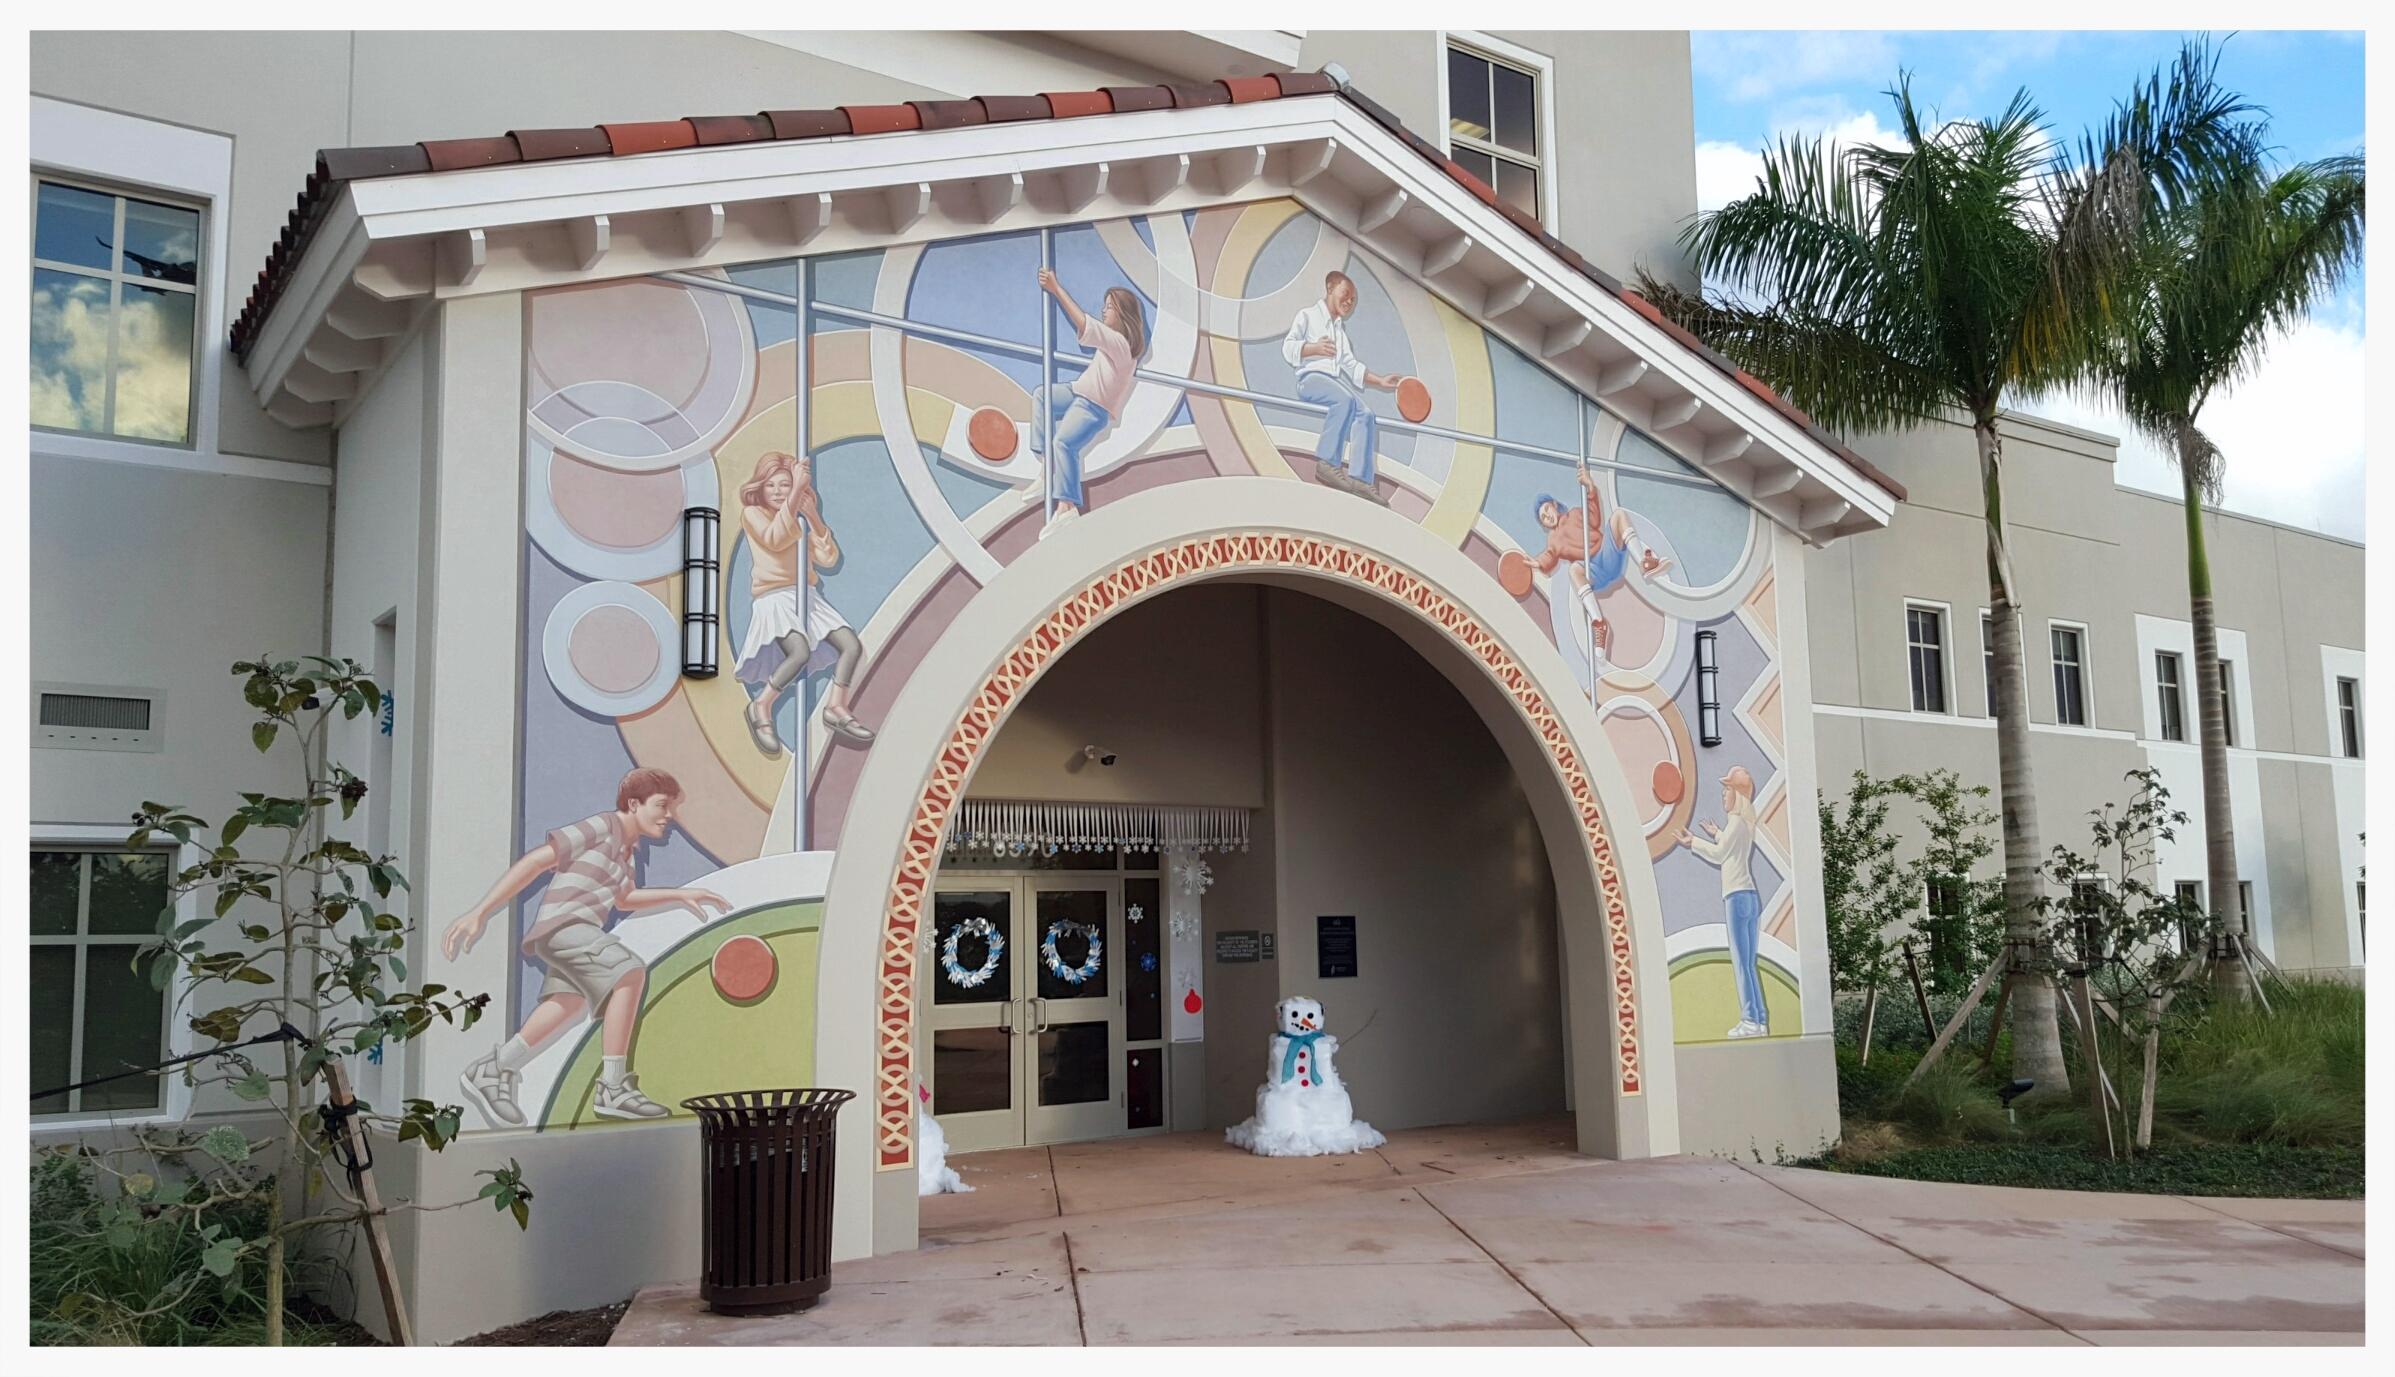 Downtown Doral Charter Elementary School,  Doral, Florida